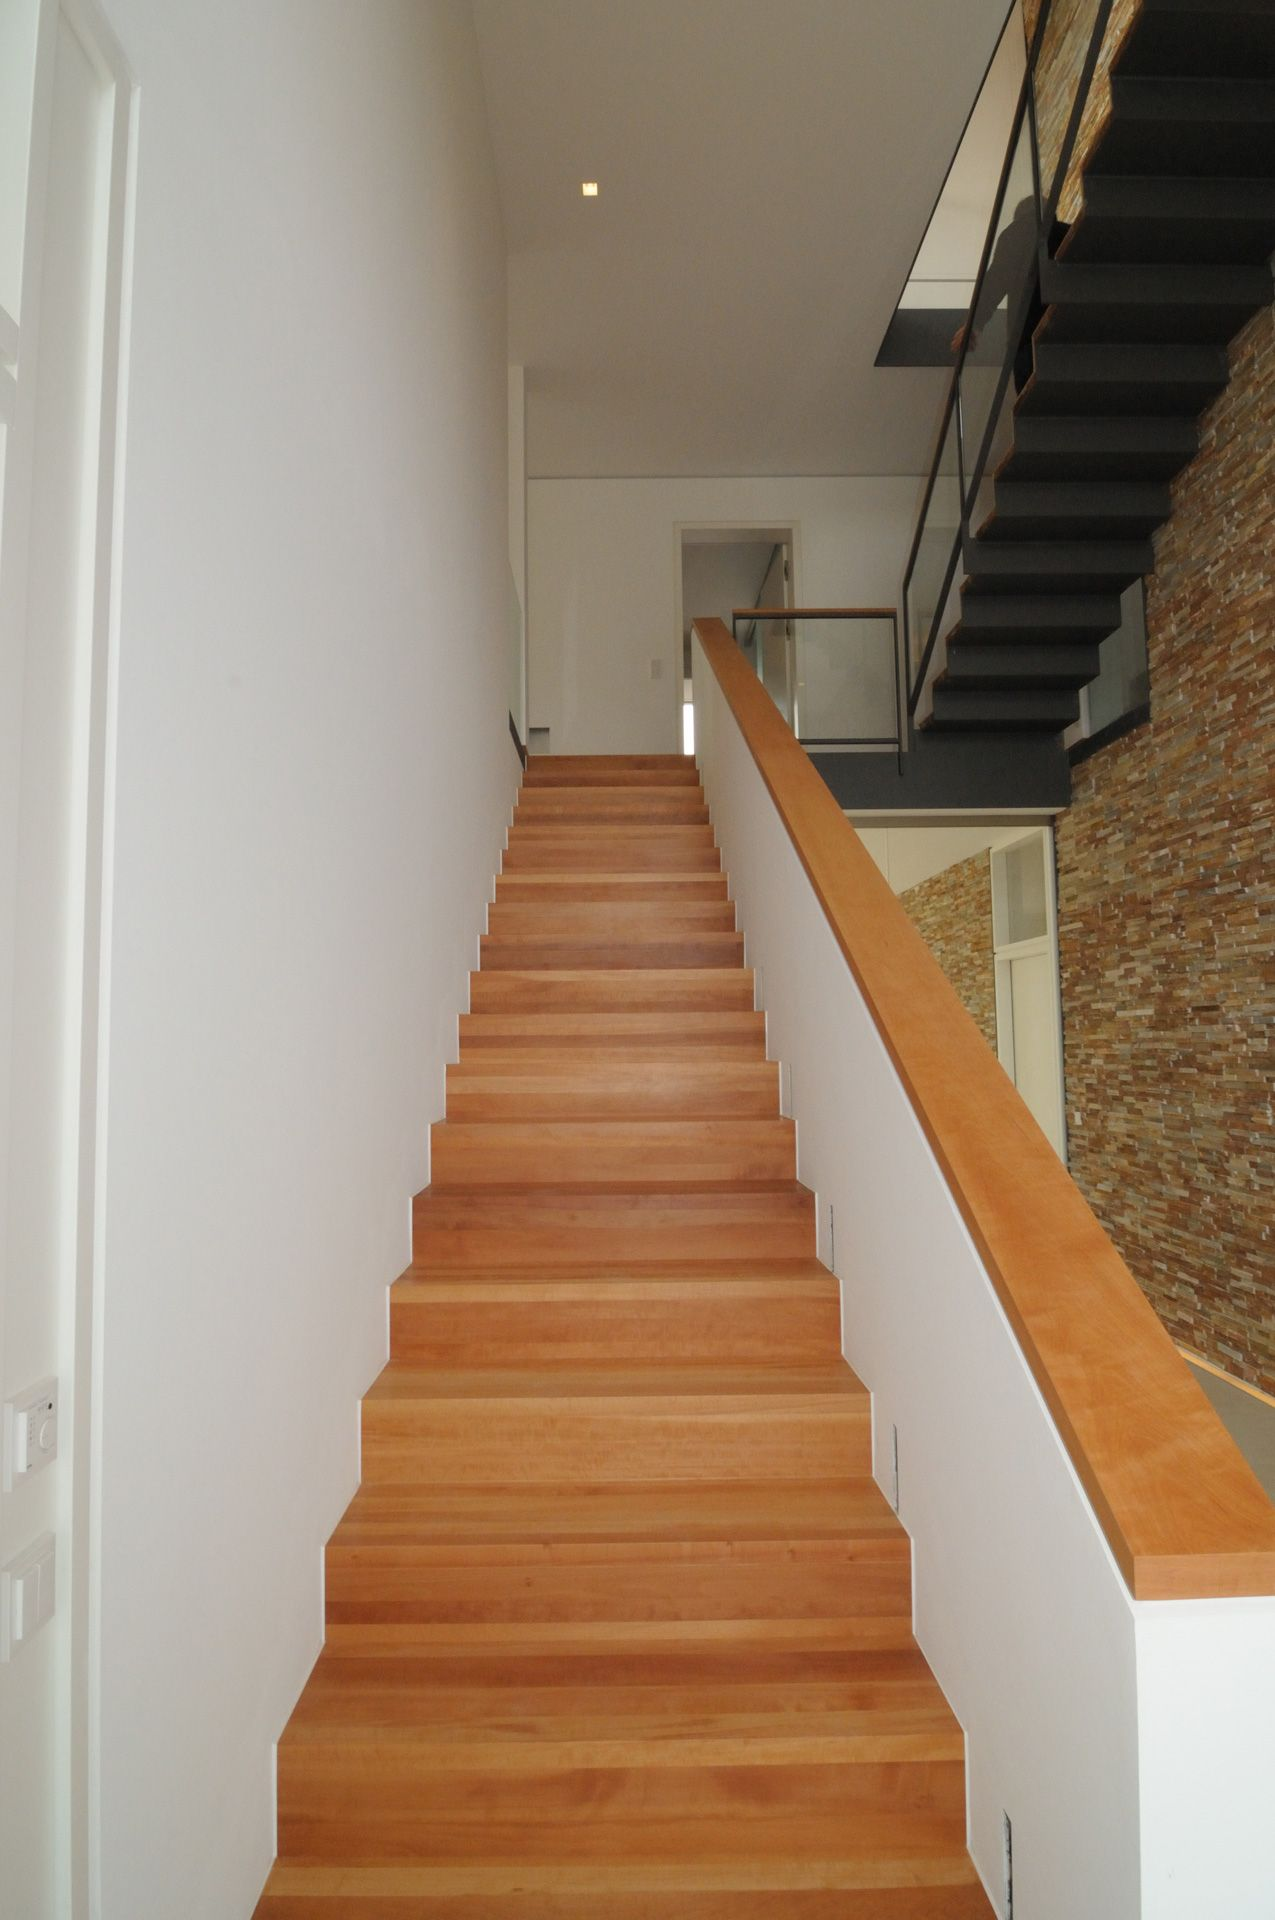 MTB-Treppe gefaltet, Birnbaum